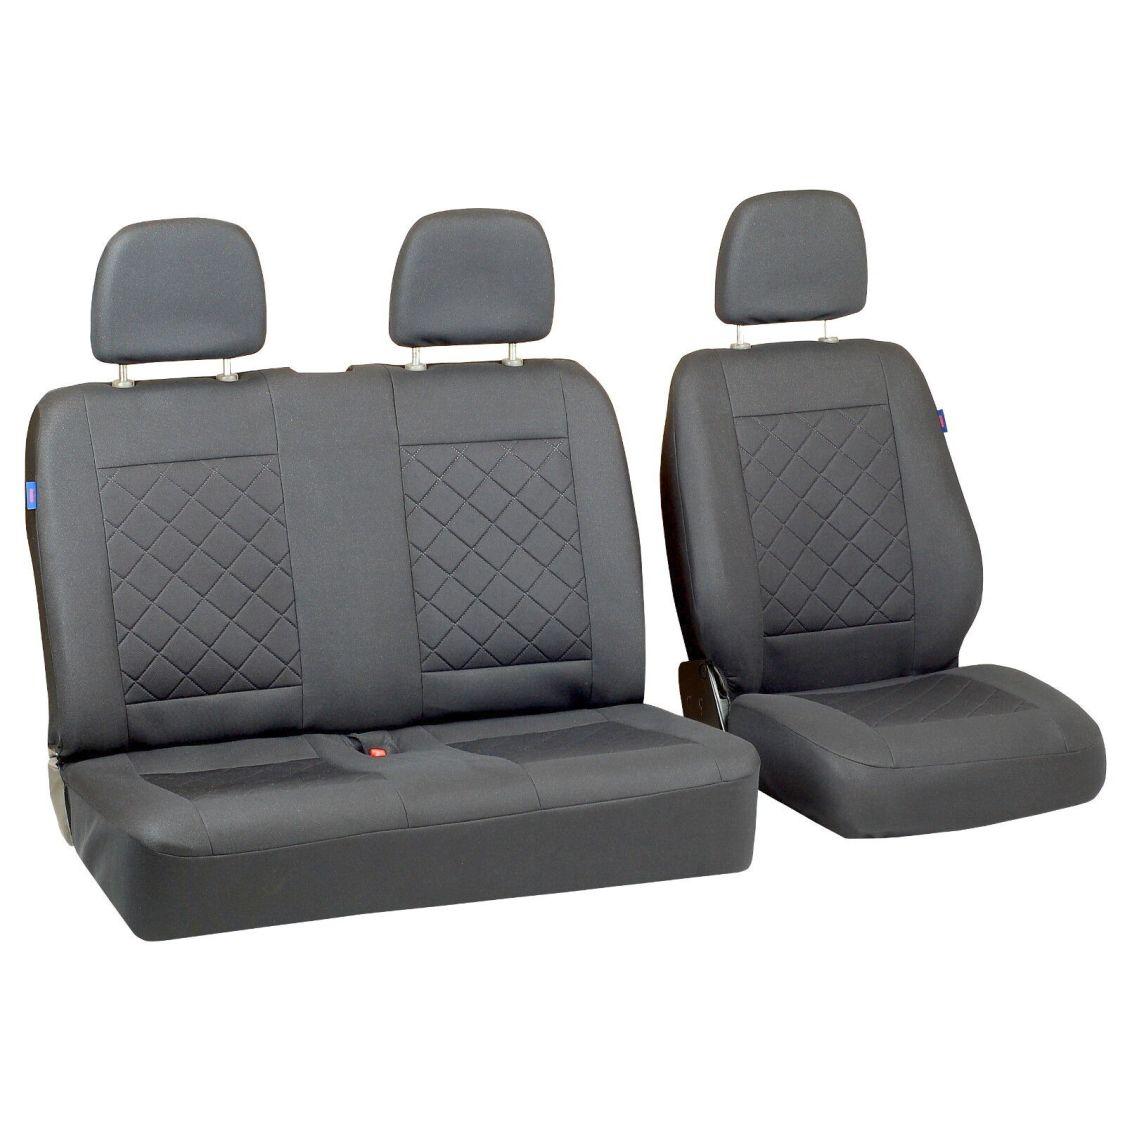 Graue Sitzbezüge für VOLKSWAGEN VW T5 Autositzbezug grau SET 1+2